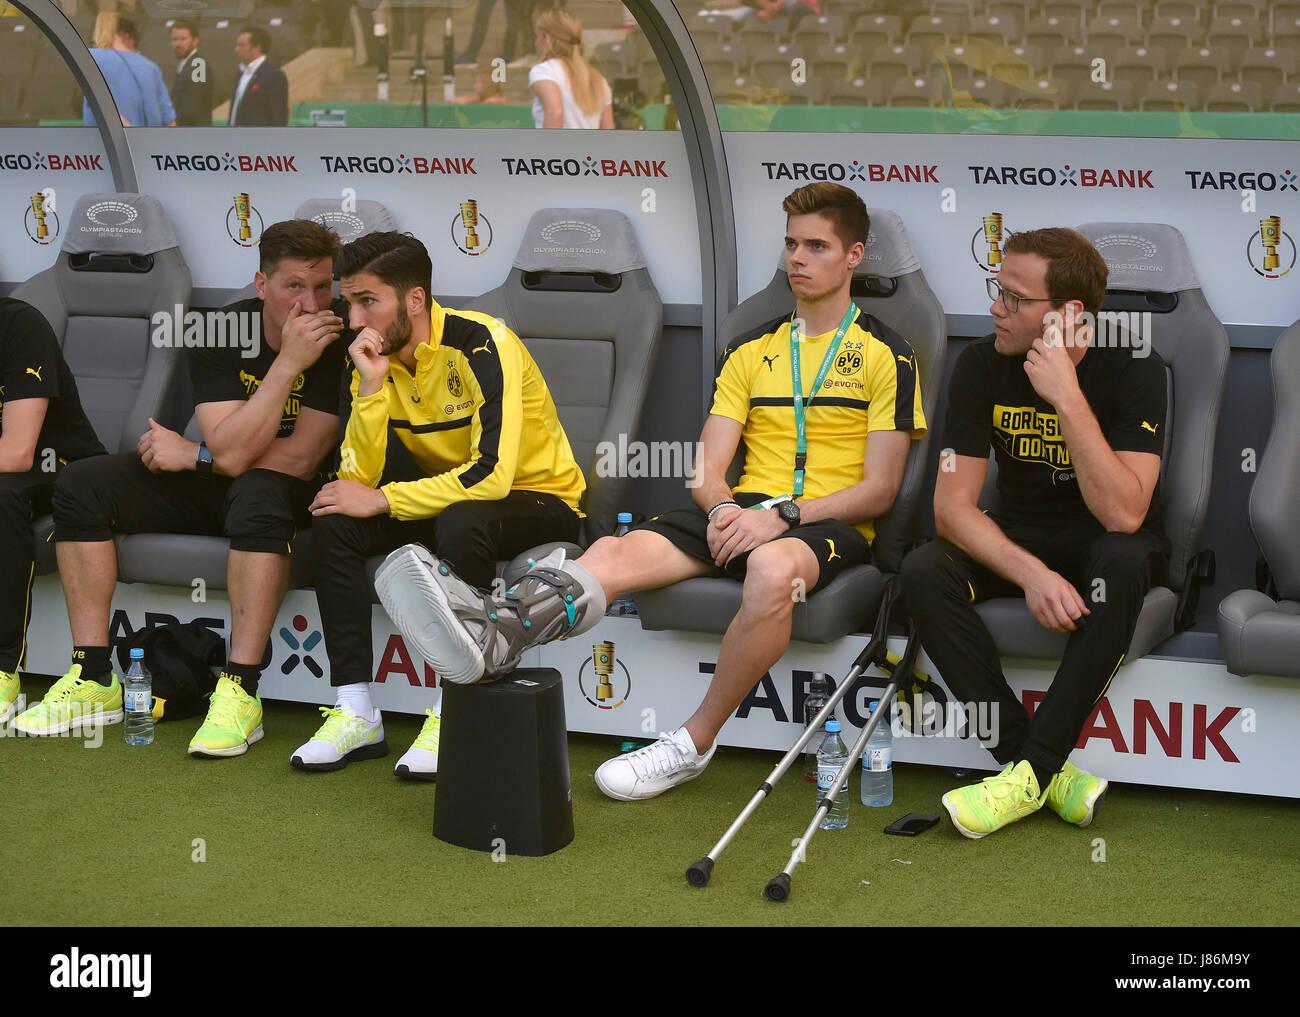 27.05.2017, Fussball DFB-Pokal 2016/17, Finale im Olympiastadion in Berlin, Eintracht Frankfurt - Borussia Dortmund, Stock Photo